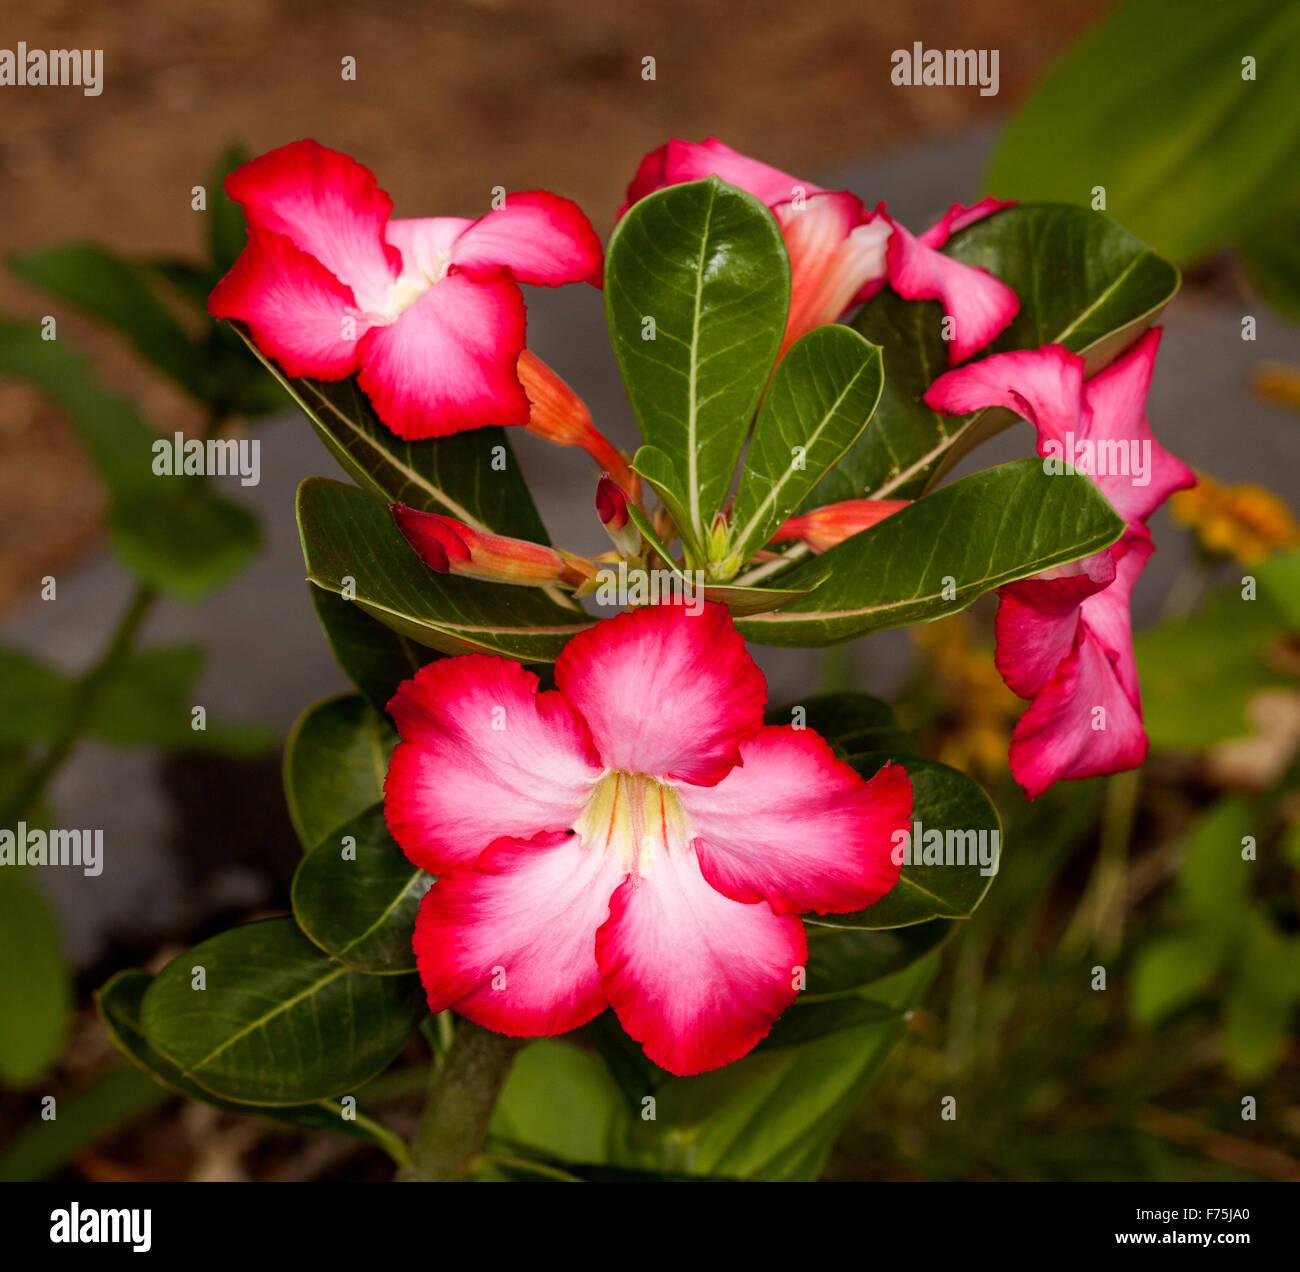 Stunning reddeep pink flowers with white throat dark green leaves stunning reddeep pink flowers with white throat dark green leaves buds of adenium obesum pretty pink african desert rose mightylinksfo